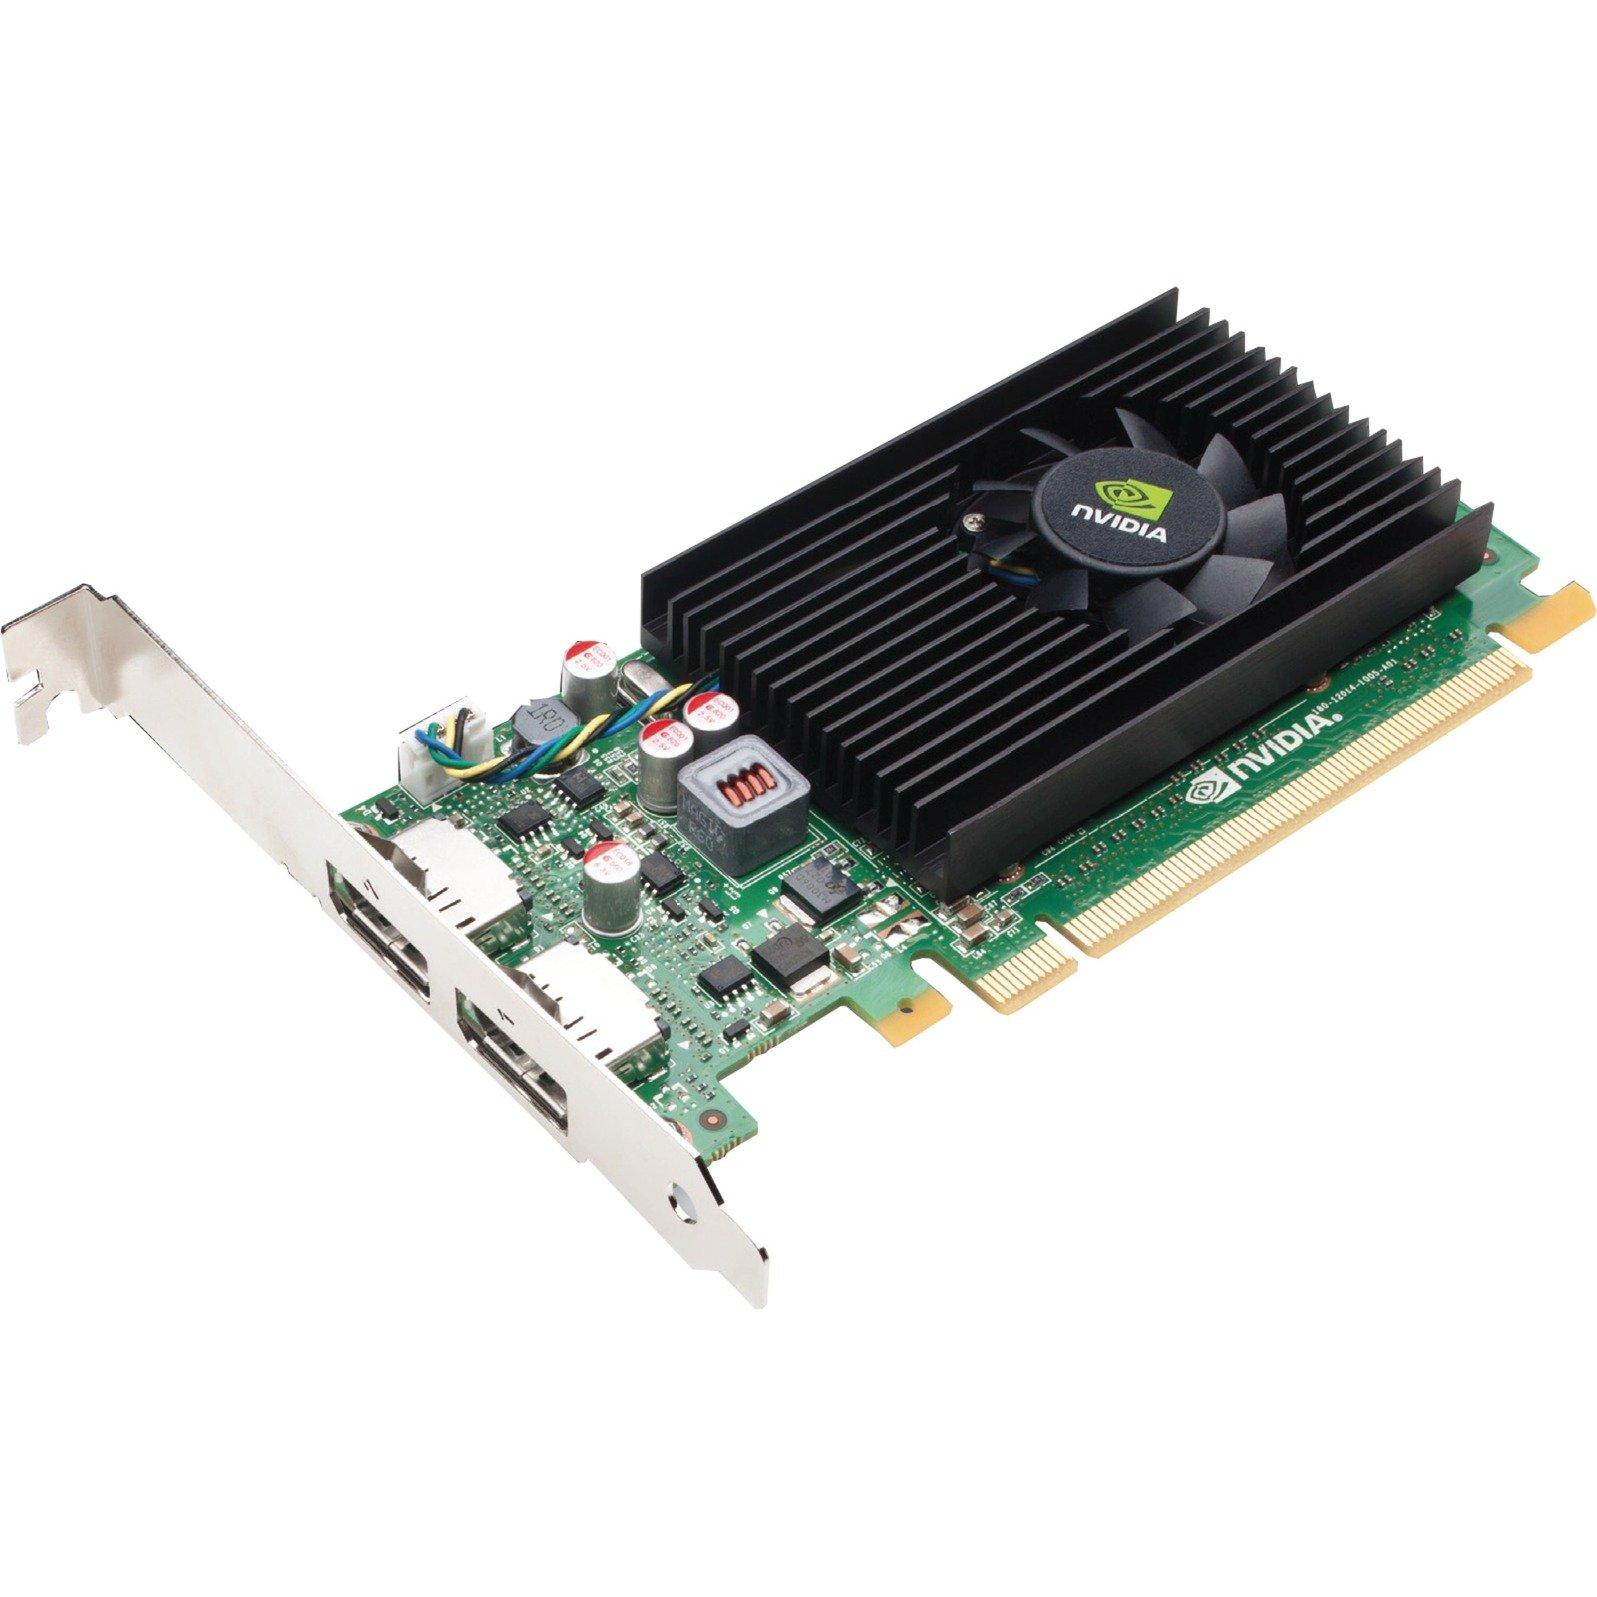 VCNVS310DP-1GB-PB tarjeta gráfica NVS 310 GDDR3